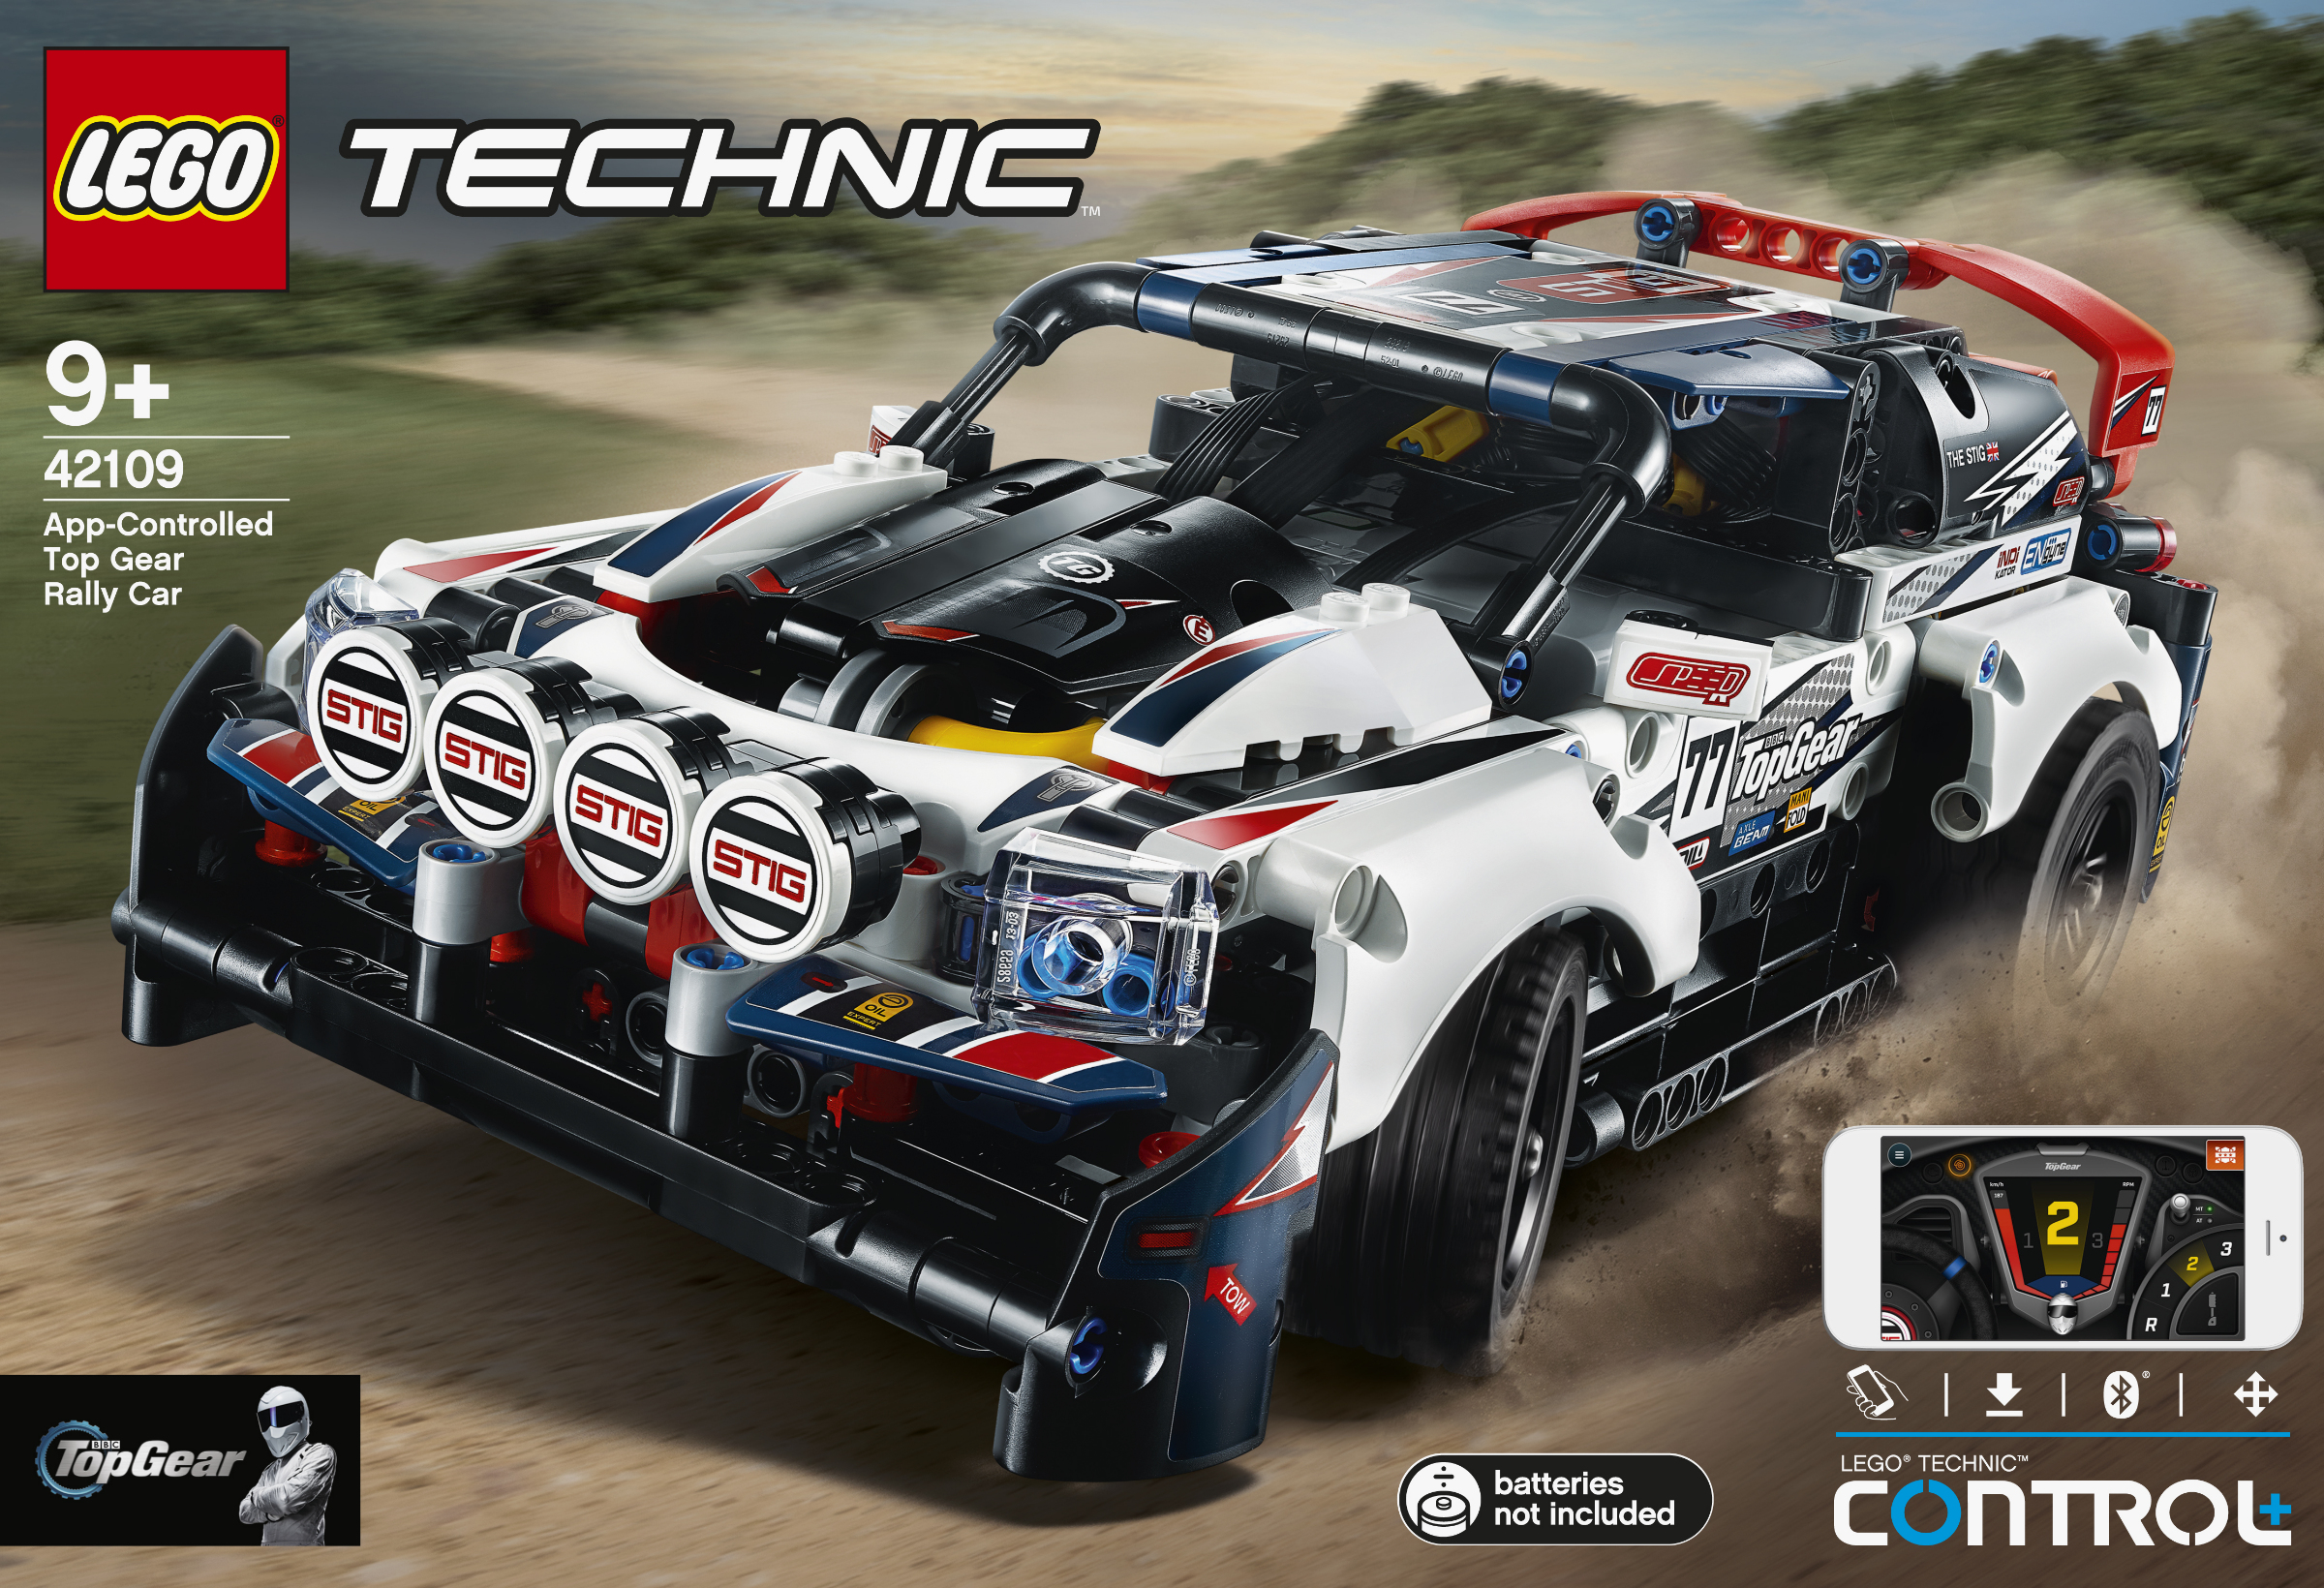 LEGO Technic - App Control Top Gear Ralley Car (42109)